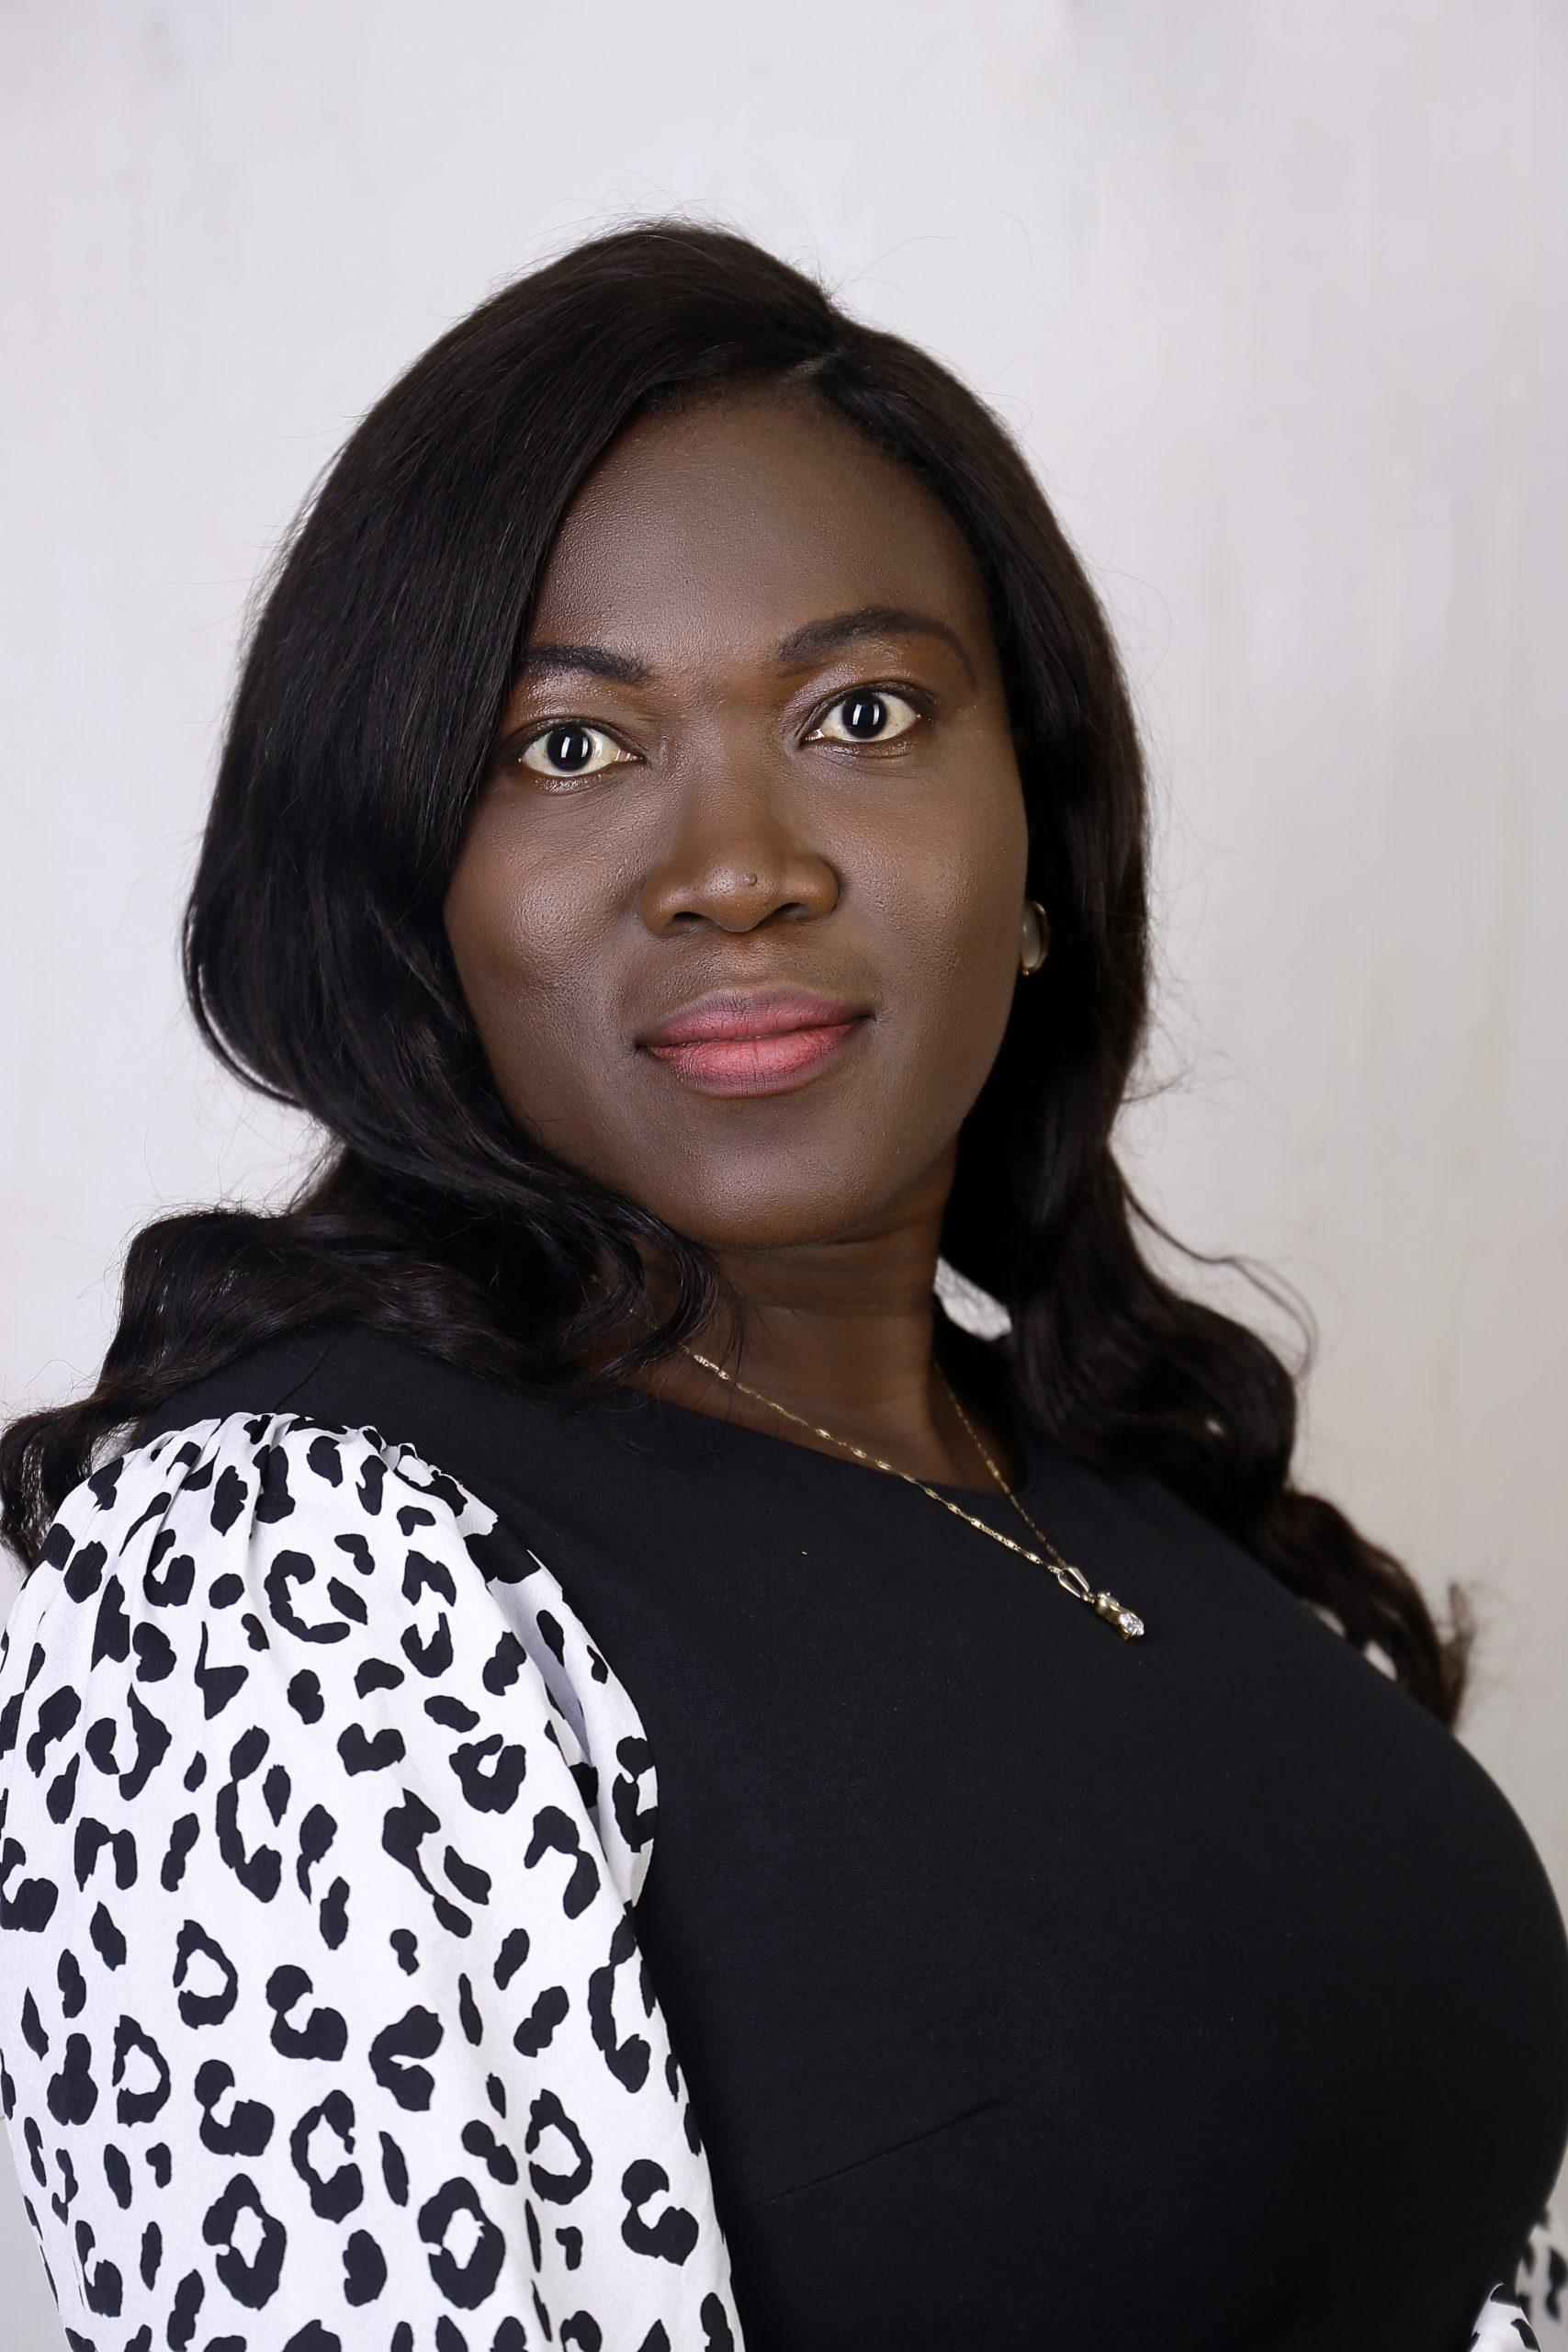 Olajumoke-Elusakin-head-facility-management-operations